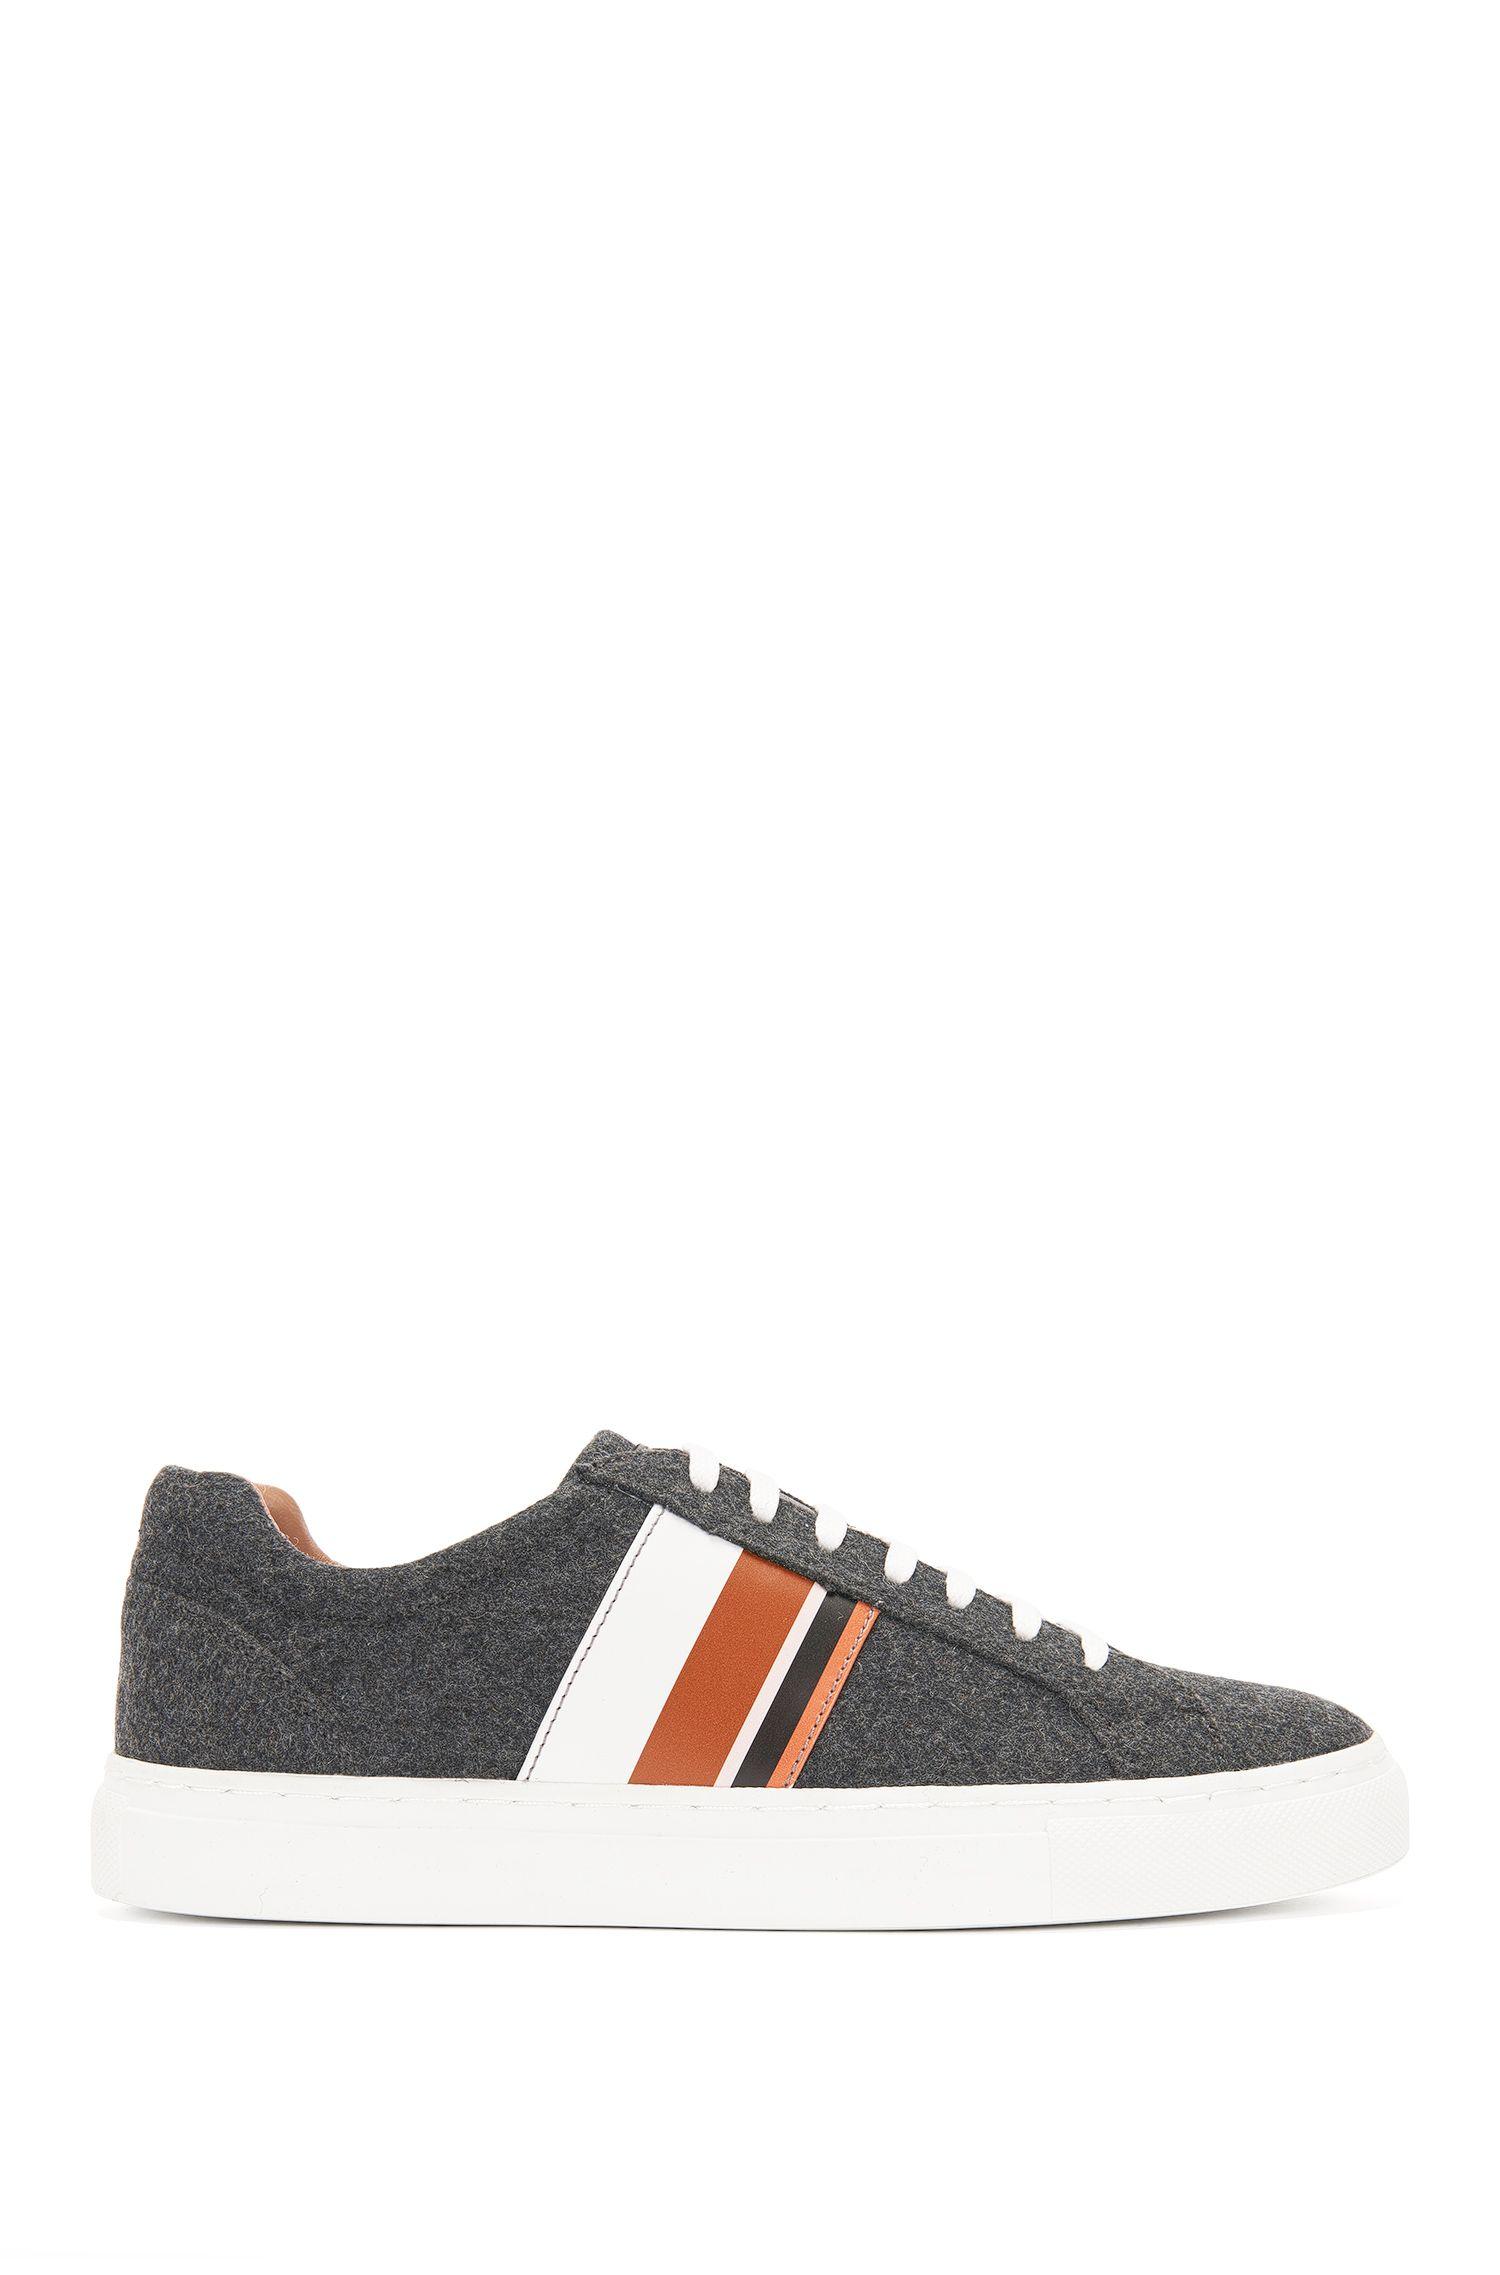 'Low Cut LB'   Wool Calfskin Sneakers